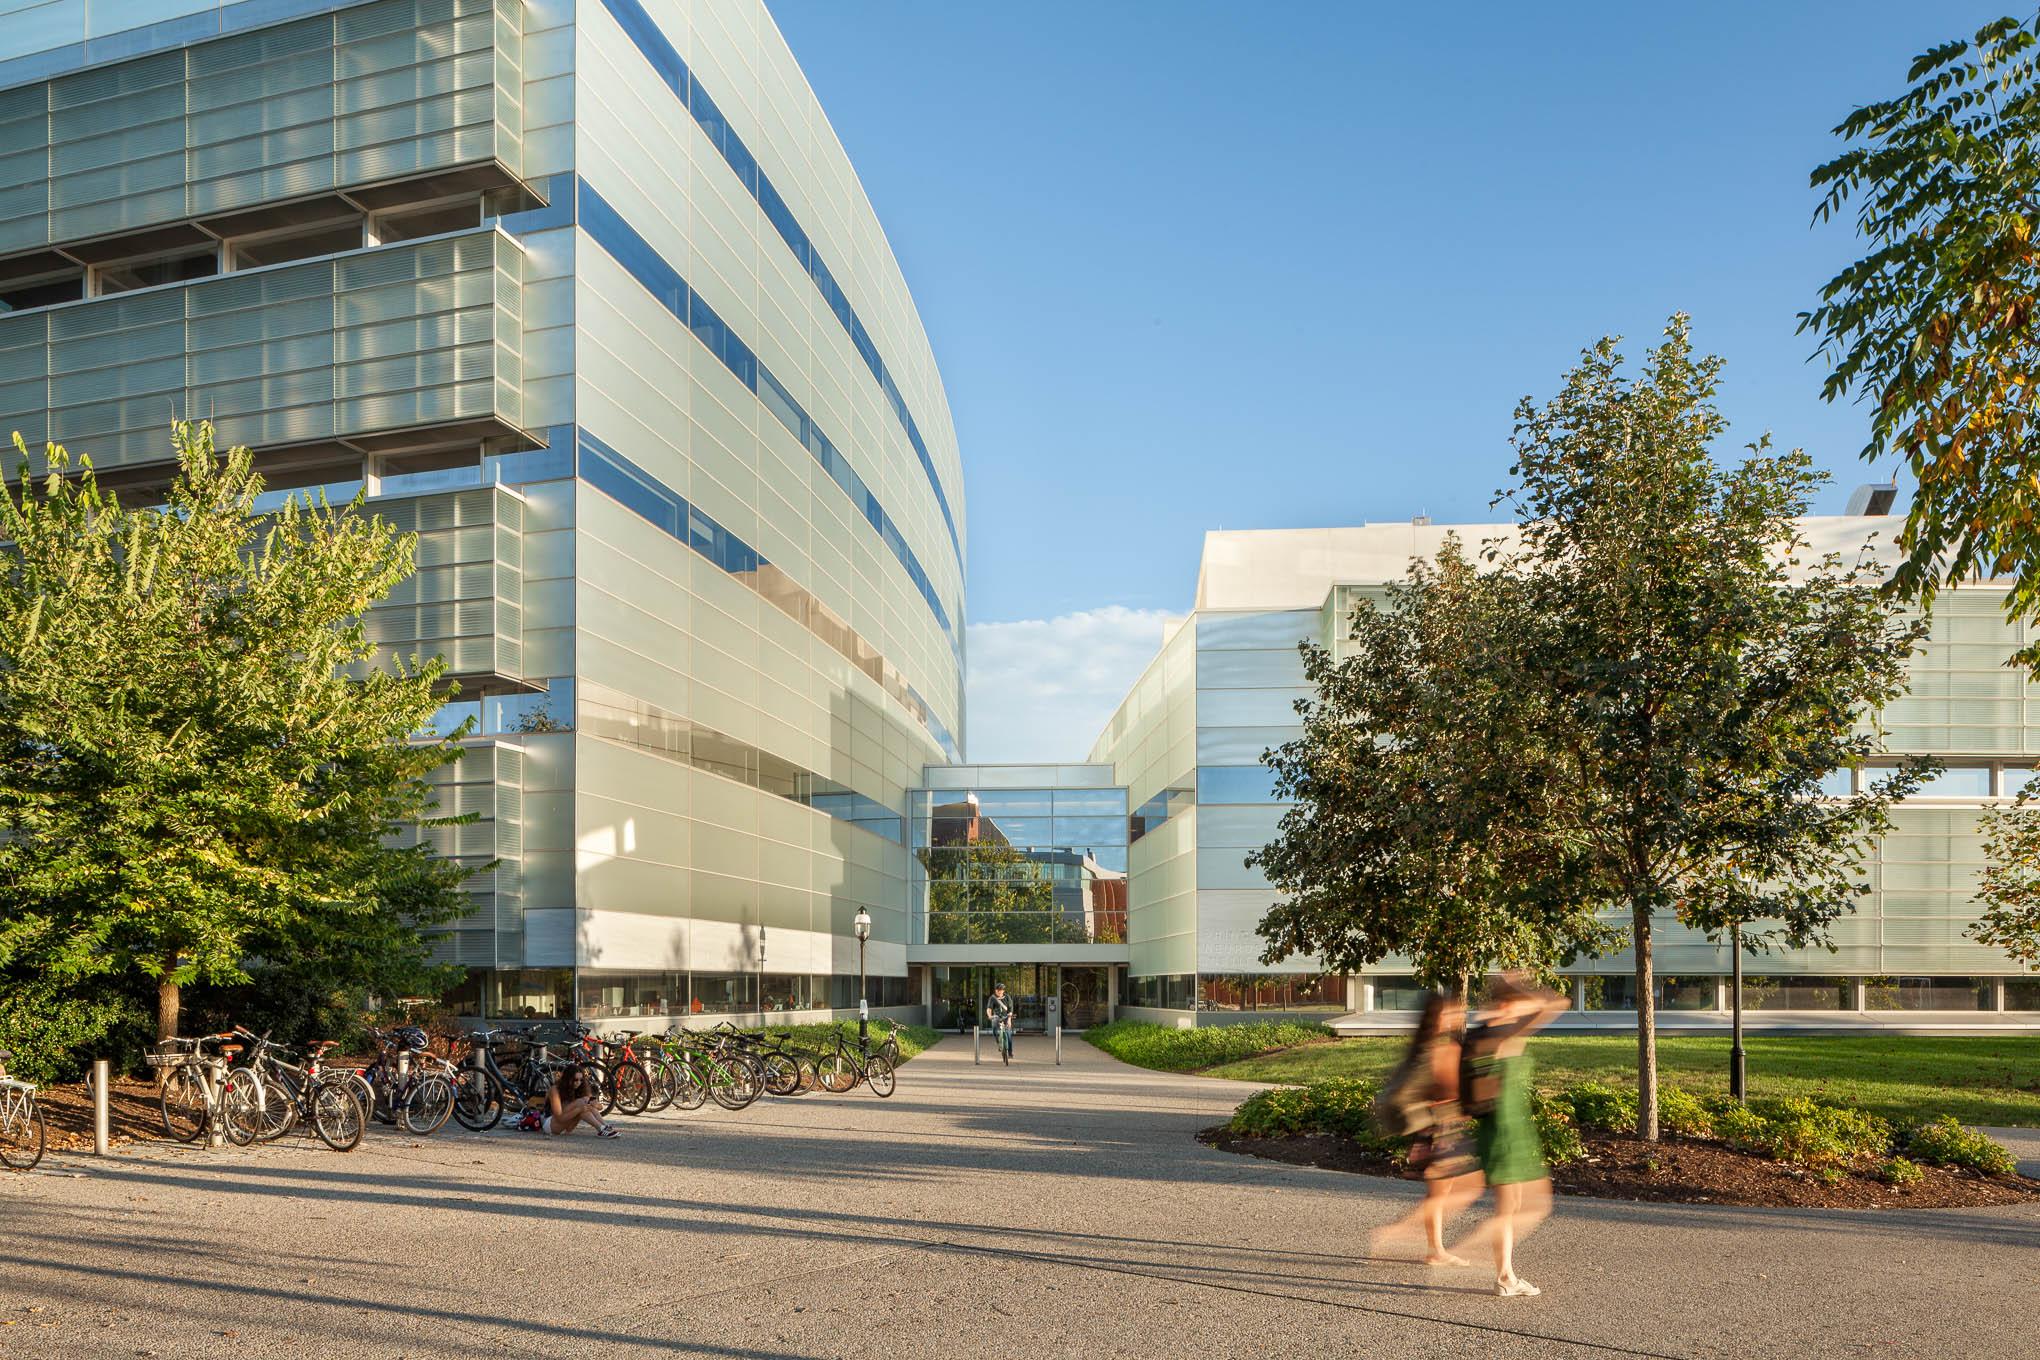 Princeton Neuroscience Institute, Princeton University, Rafael Moneo Architect